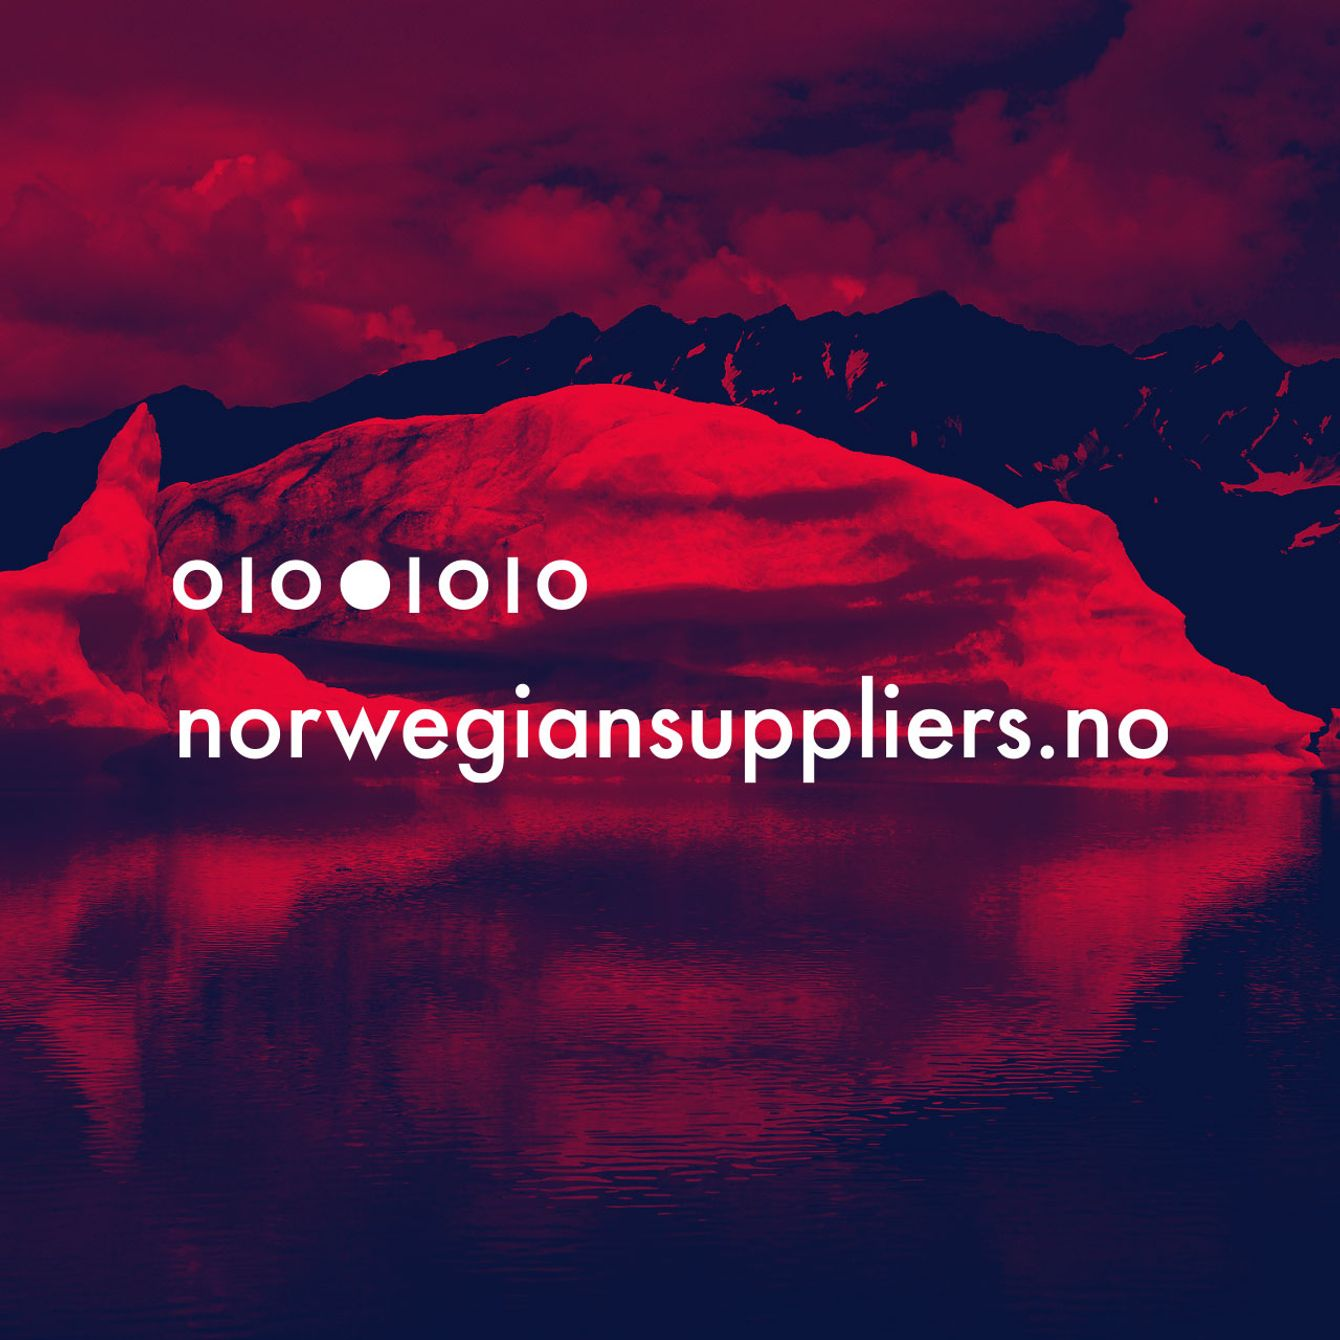 Skjermdump  av Norwegiansuppliers.no